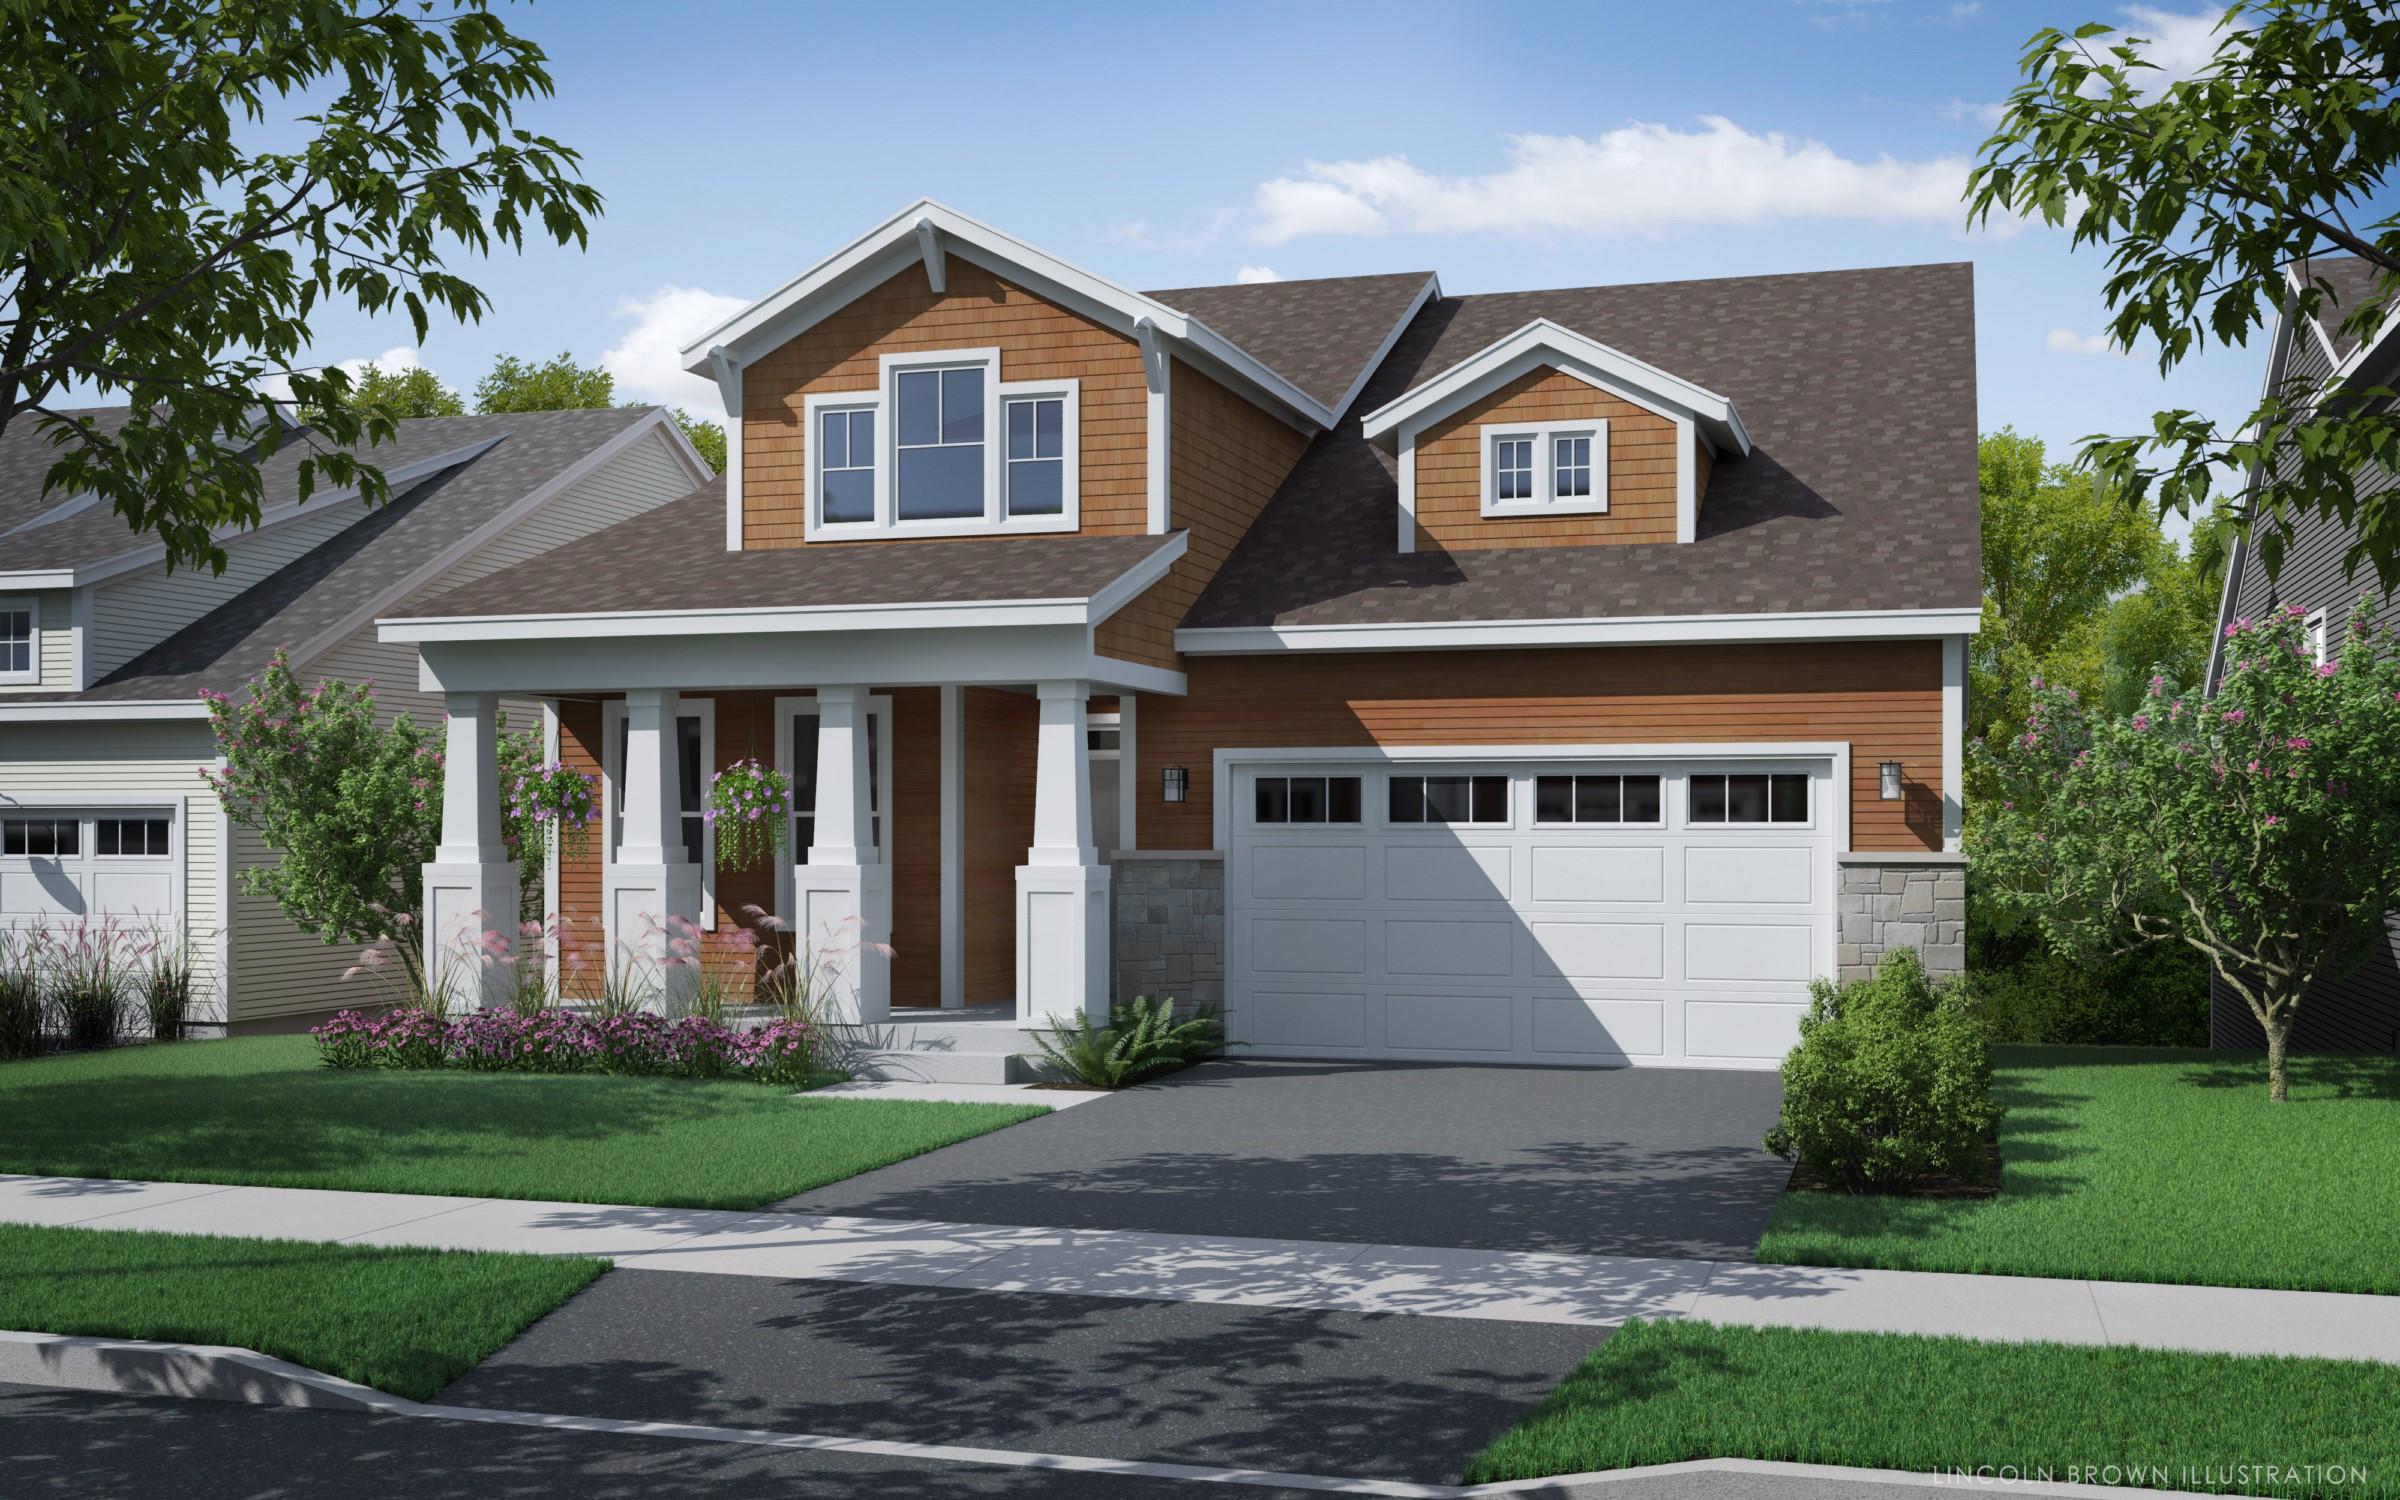 2015-20 Home Farm - SF1 Primrose Craftsman.jpg